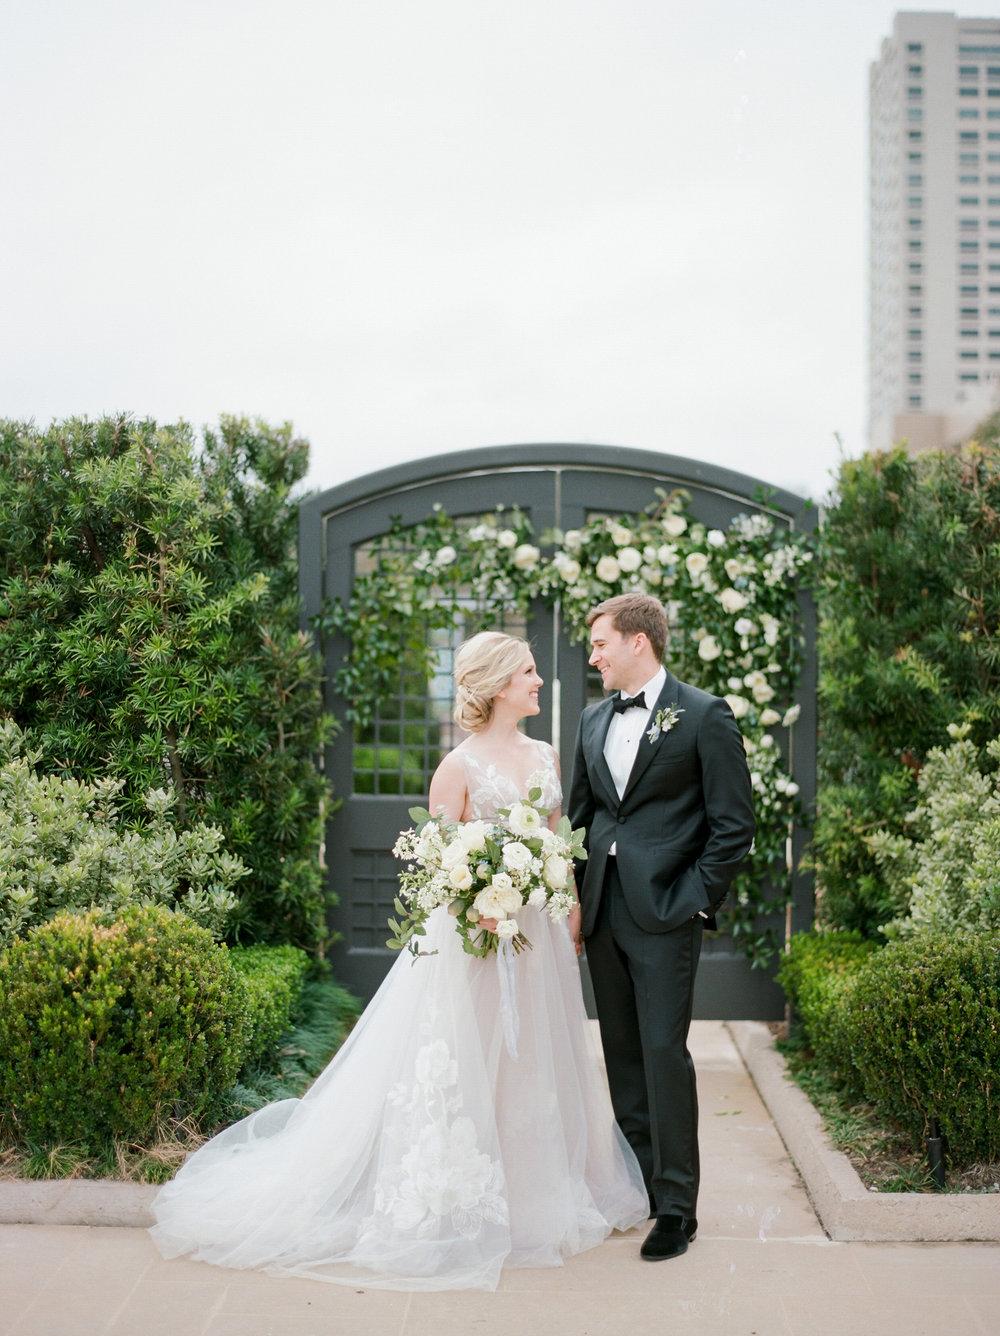 McGovern-Centennial-Gardens-Houston-Texas-Wedding-Venue-Josh-Dana-Fernandez-Photography-Film-Destination-Fine-Art-Luxury-Top-Best-Austin-Dallas-Magnolia-Rouge-Jennifer-Laura-Design-3.jpg